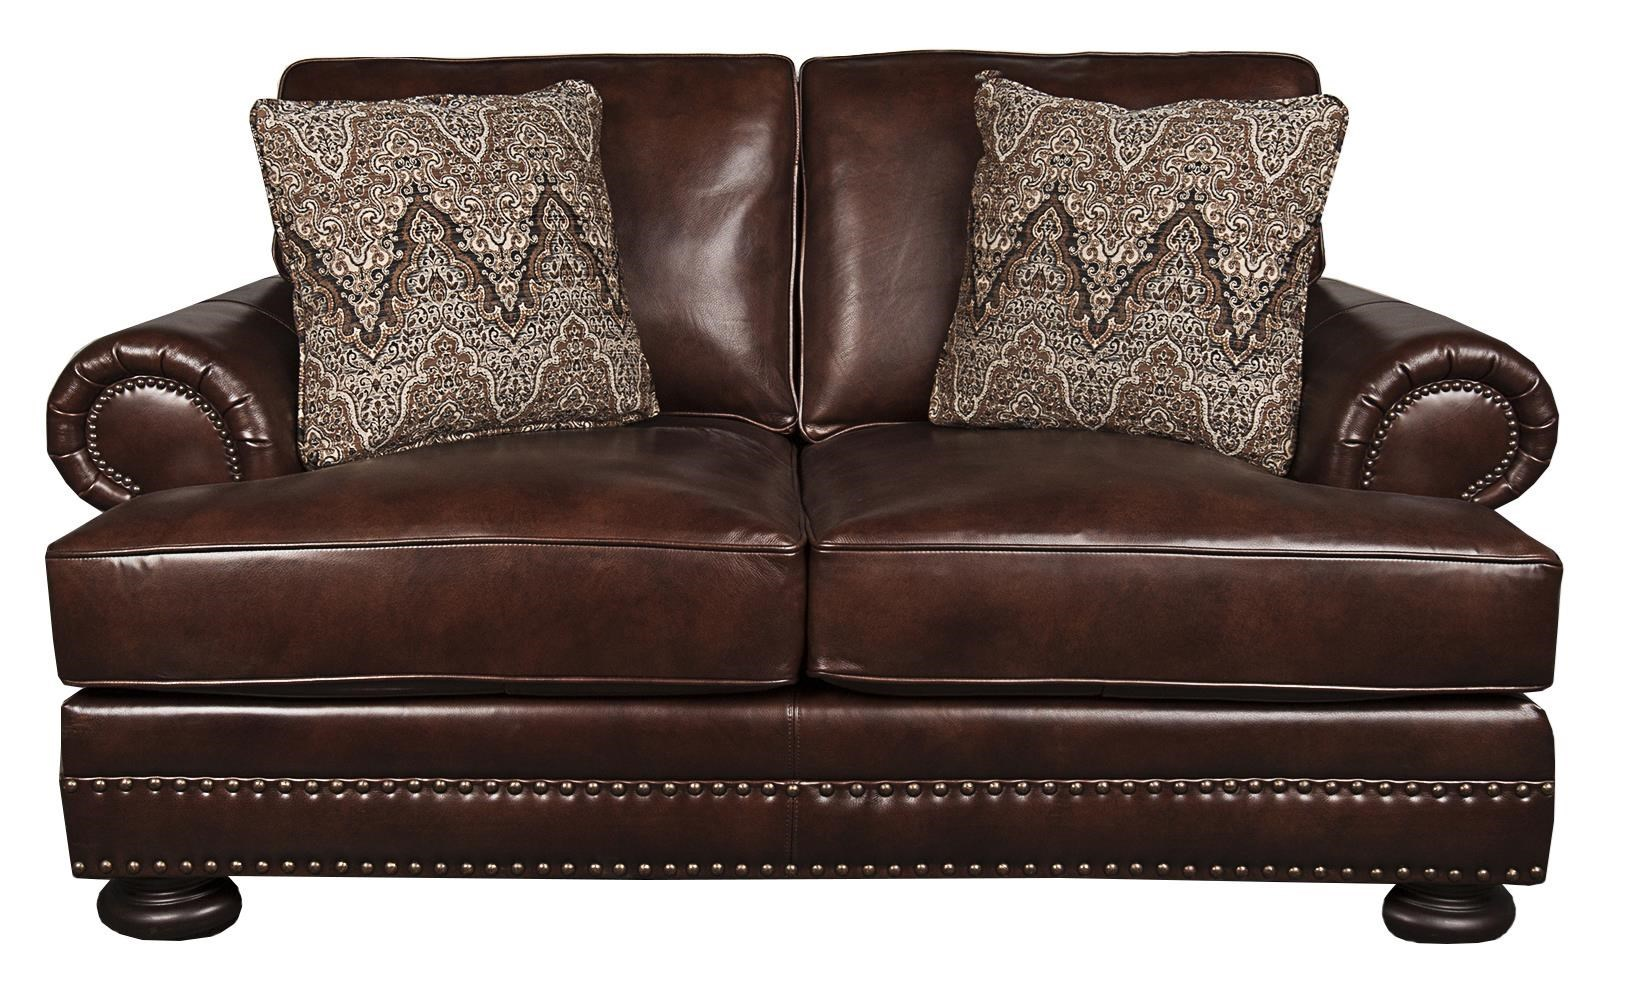 Delightful Bernhardt FosterFoster 100% Leather Loveseat ...